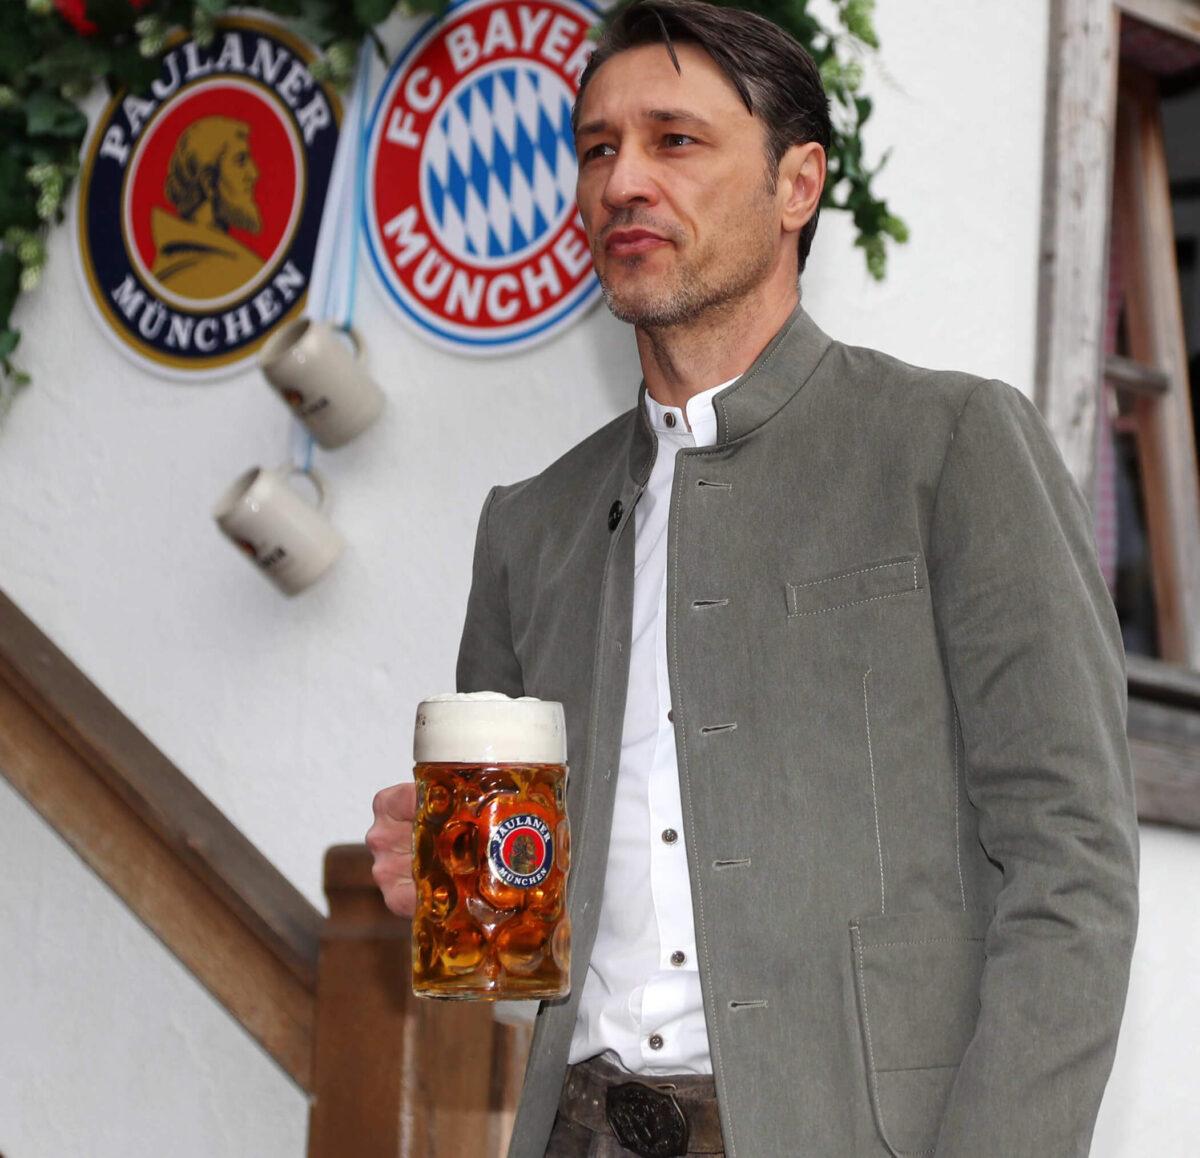 Bayern viert Oktoberfest